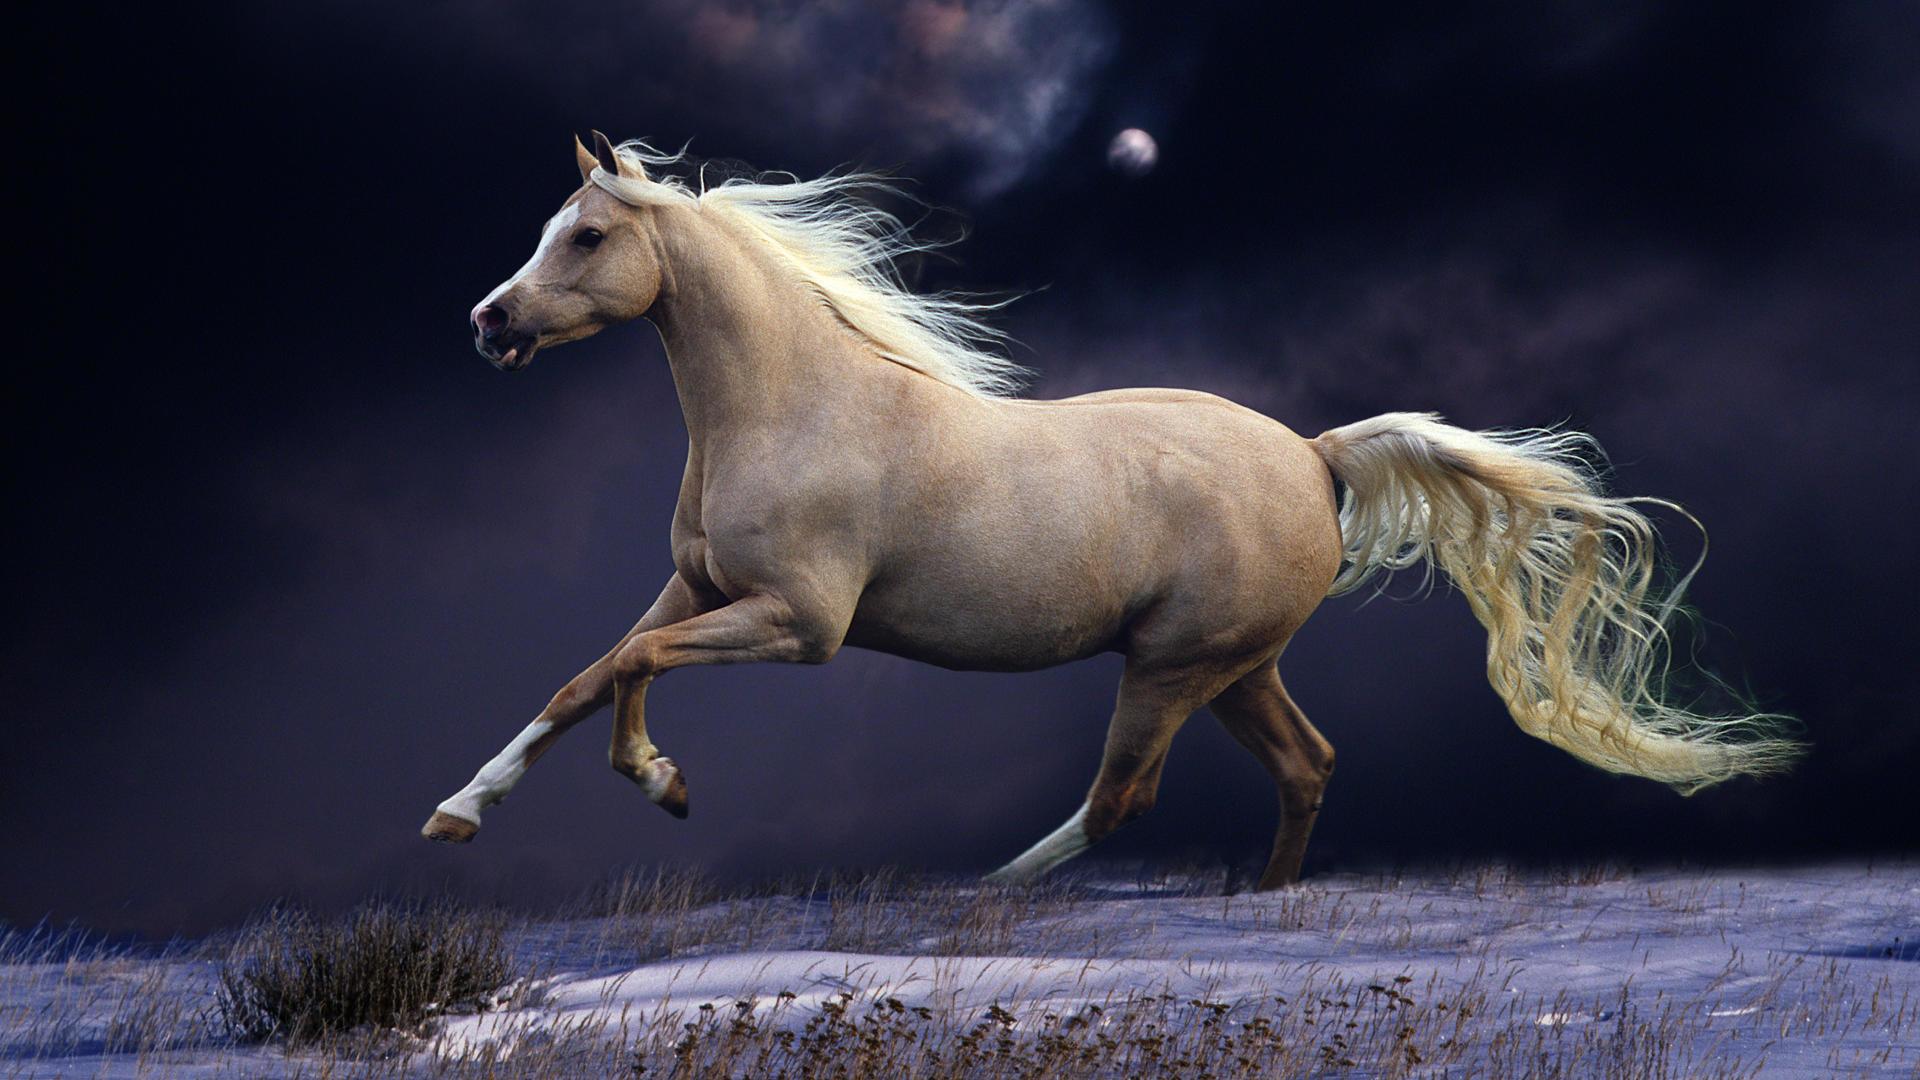 0 Horse Wallpapers Horse Wallpapers Best Wallpapers